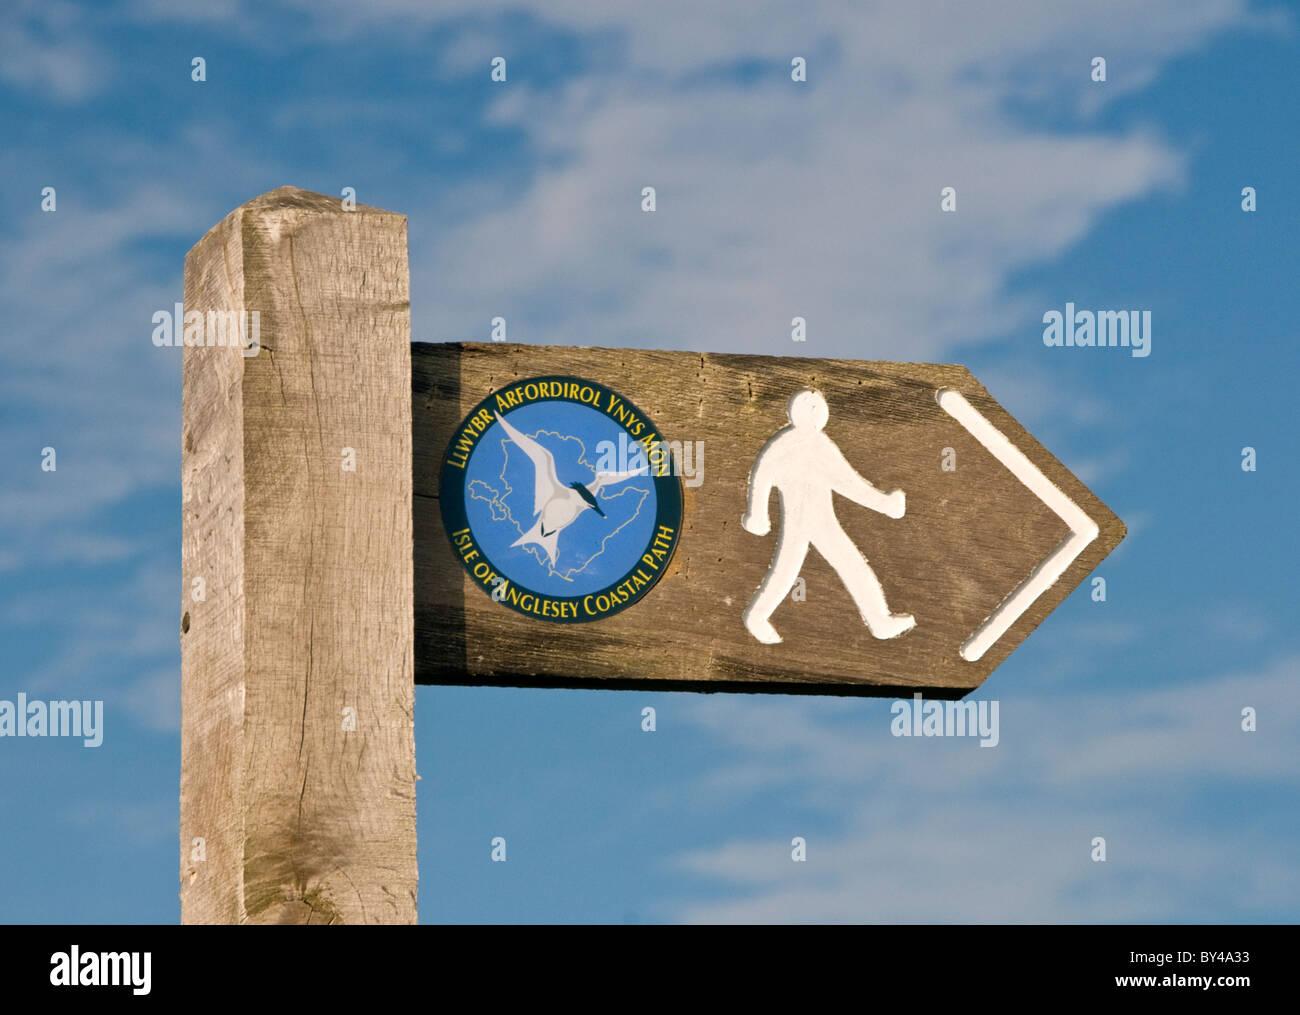 Isle of Anglesey Coastal Path Signpost, Anglesey, Wales, UK - Stock Image